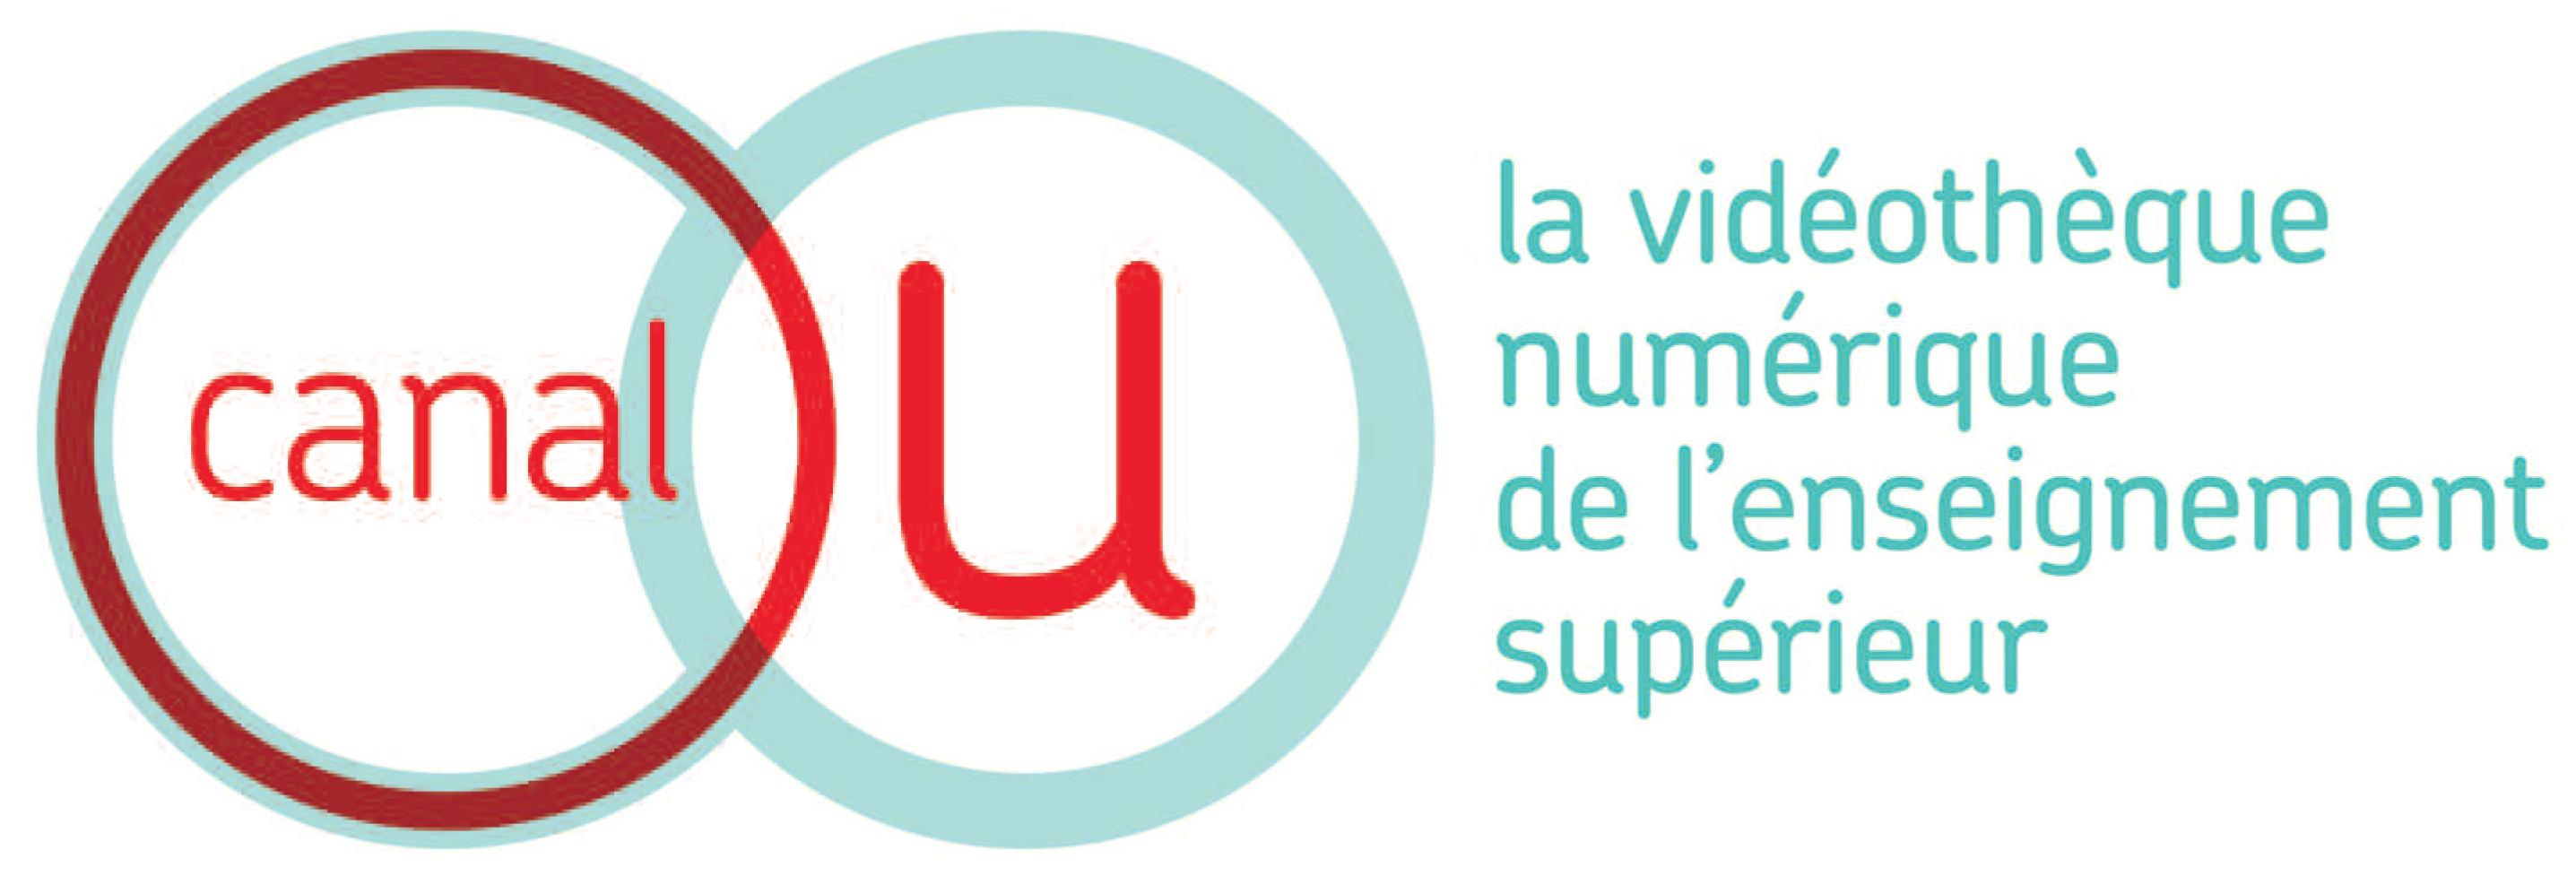 Canal-U logo